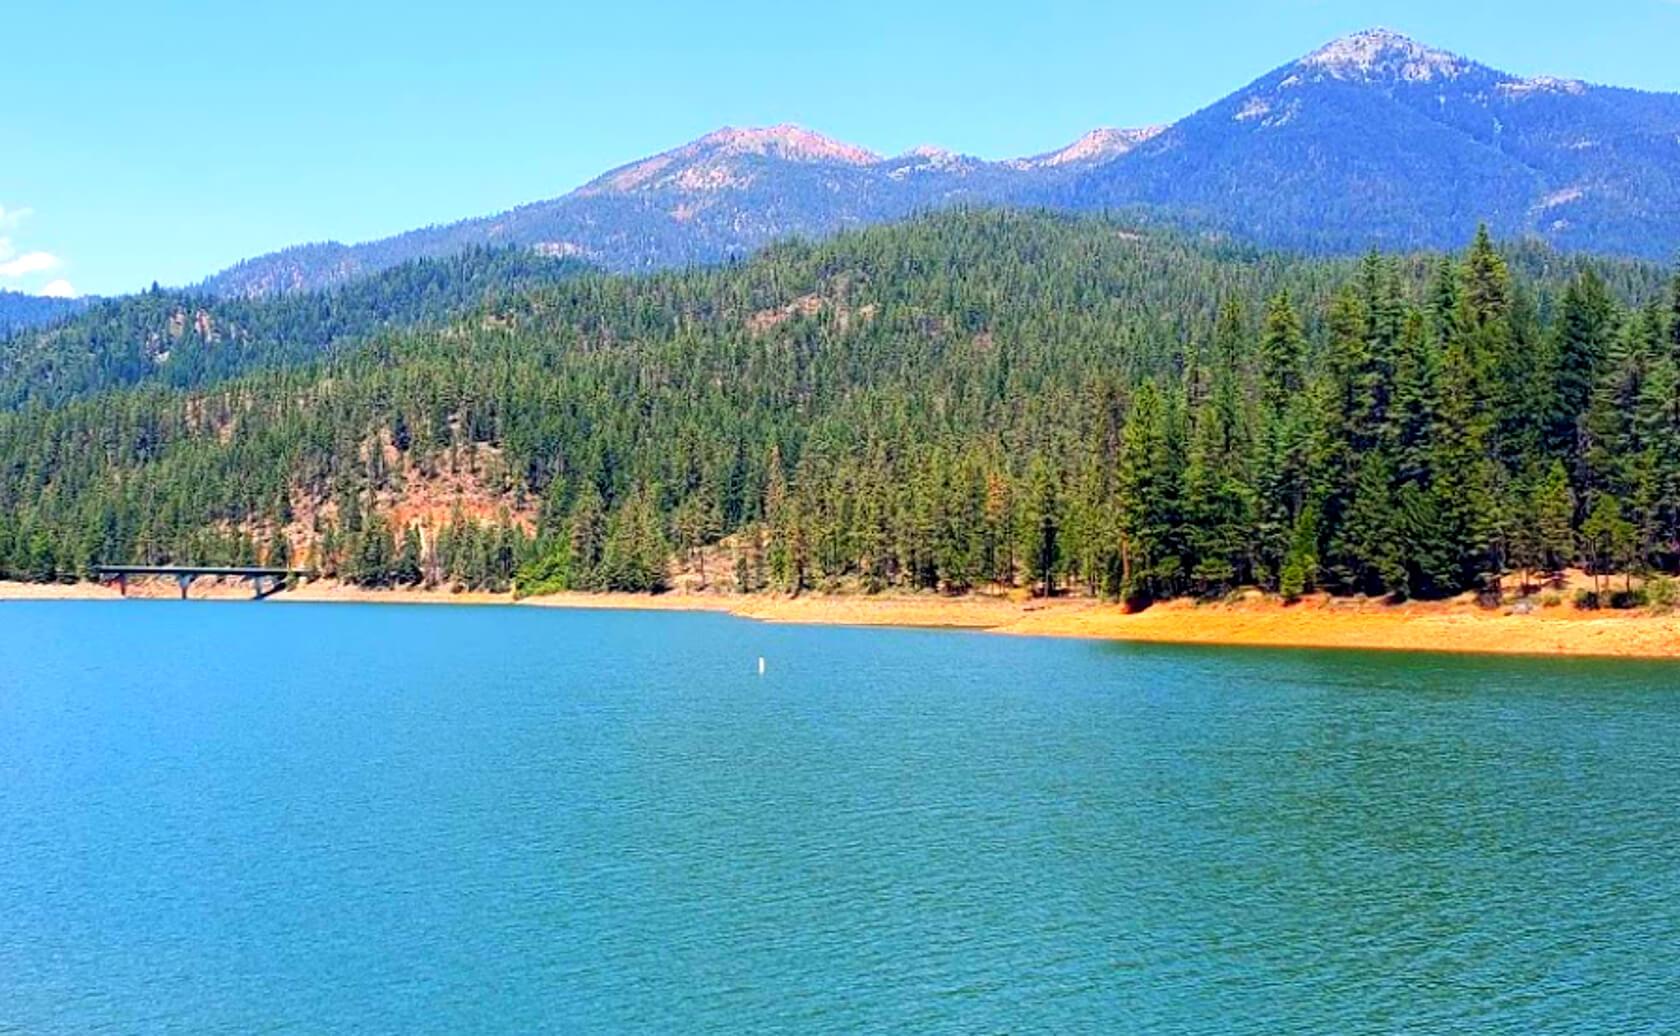 Trinity-Lake-Fishing-Guide-Report-California-02